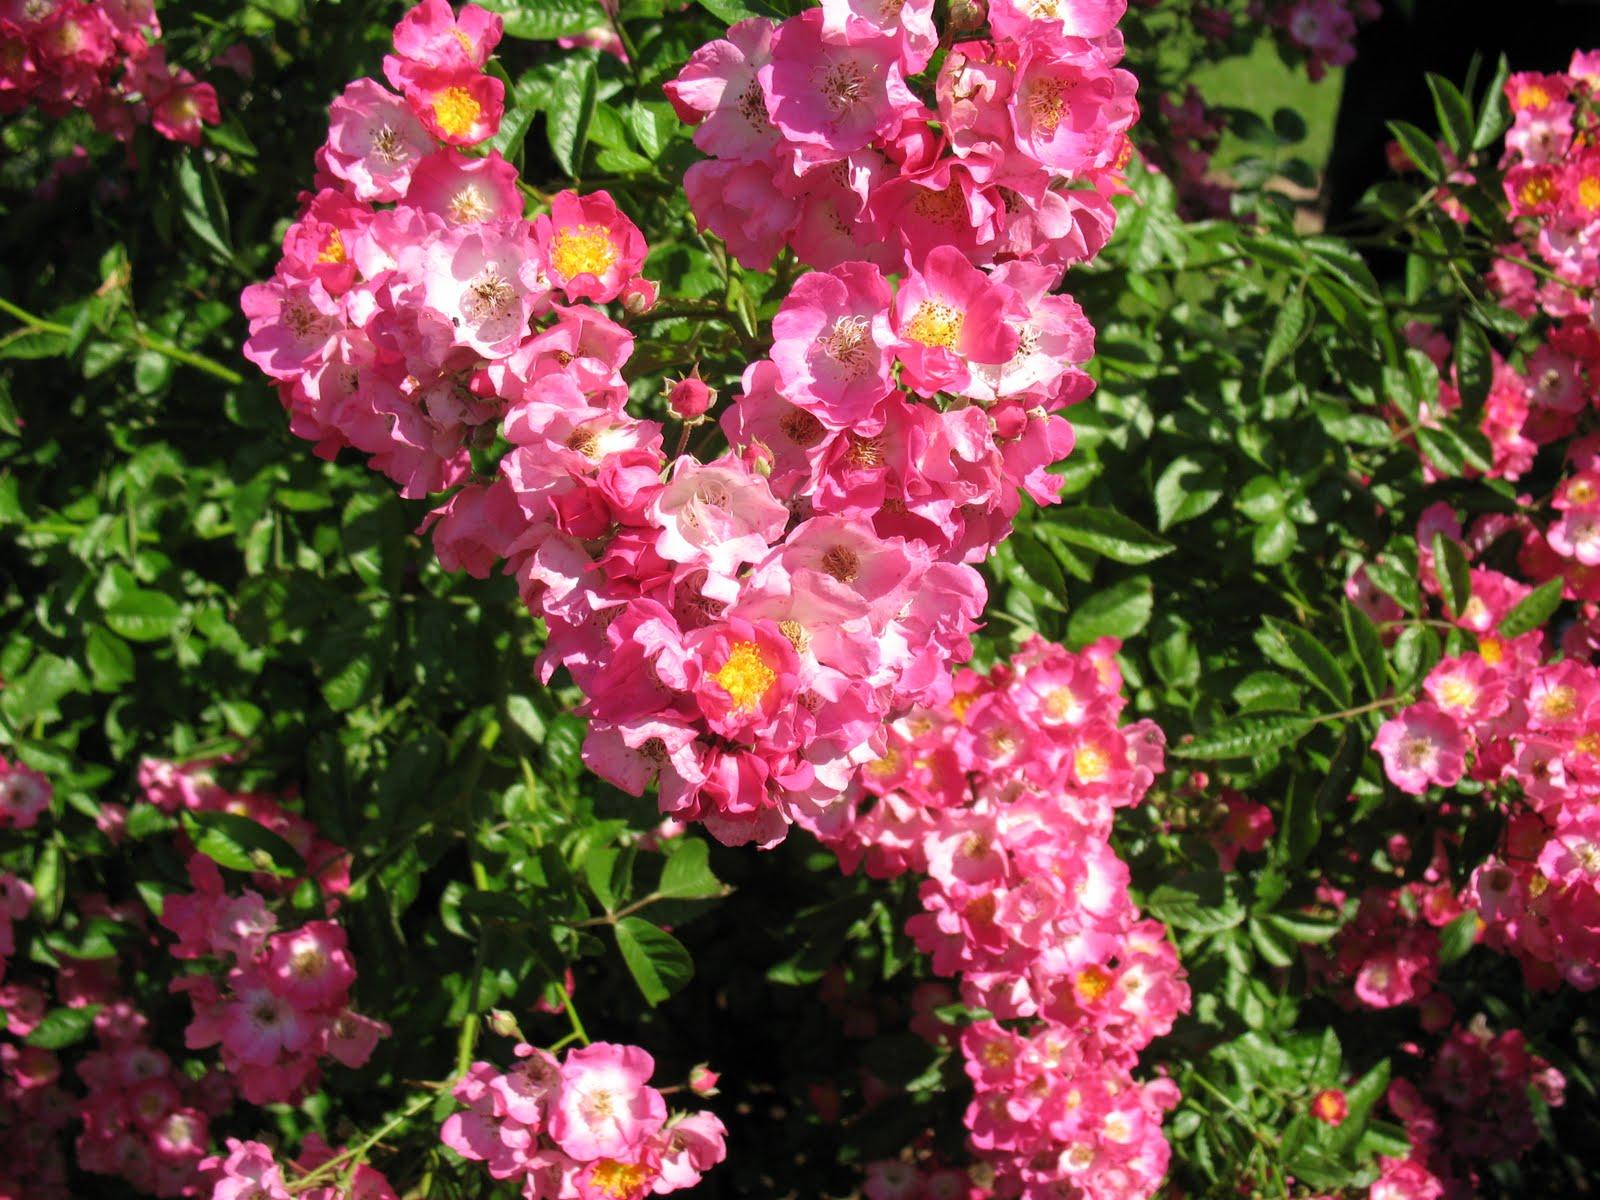 Roses du jardin ch neland rosier maria lisa - Comment tailler les rosiers ...